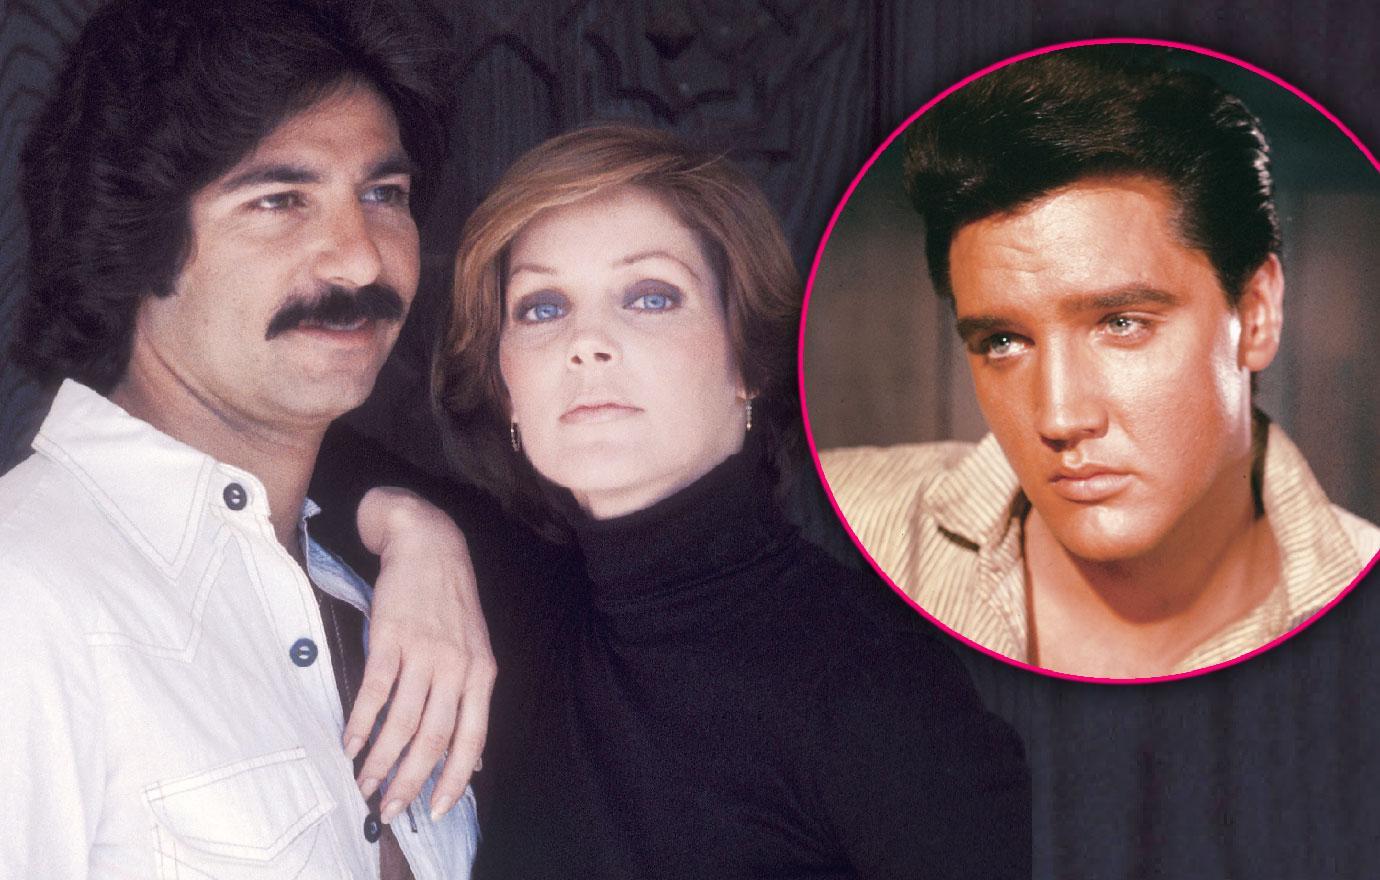 Priscilla Presley Let Elvis Listen To Her Making Love To Robert Kardashian